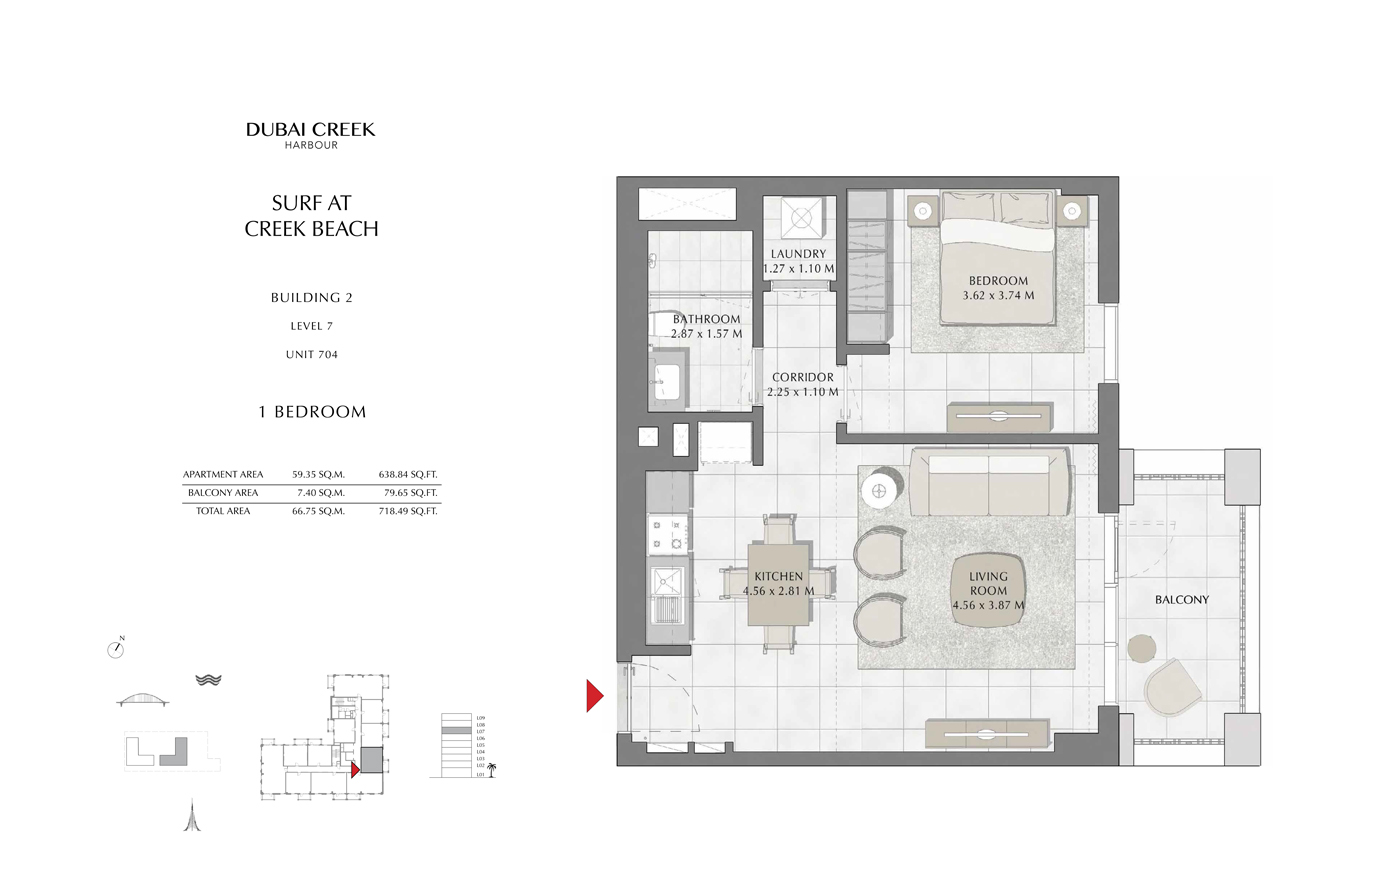 Building 2, 1 Bedroom Level 7, Size 718 Sq Ft